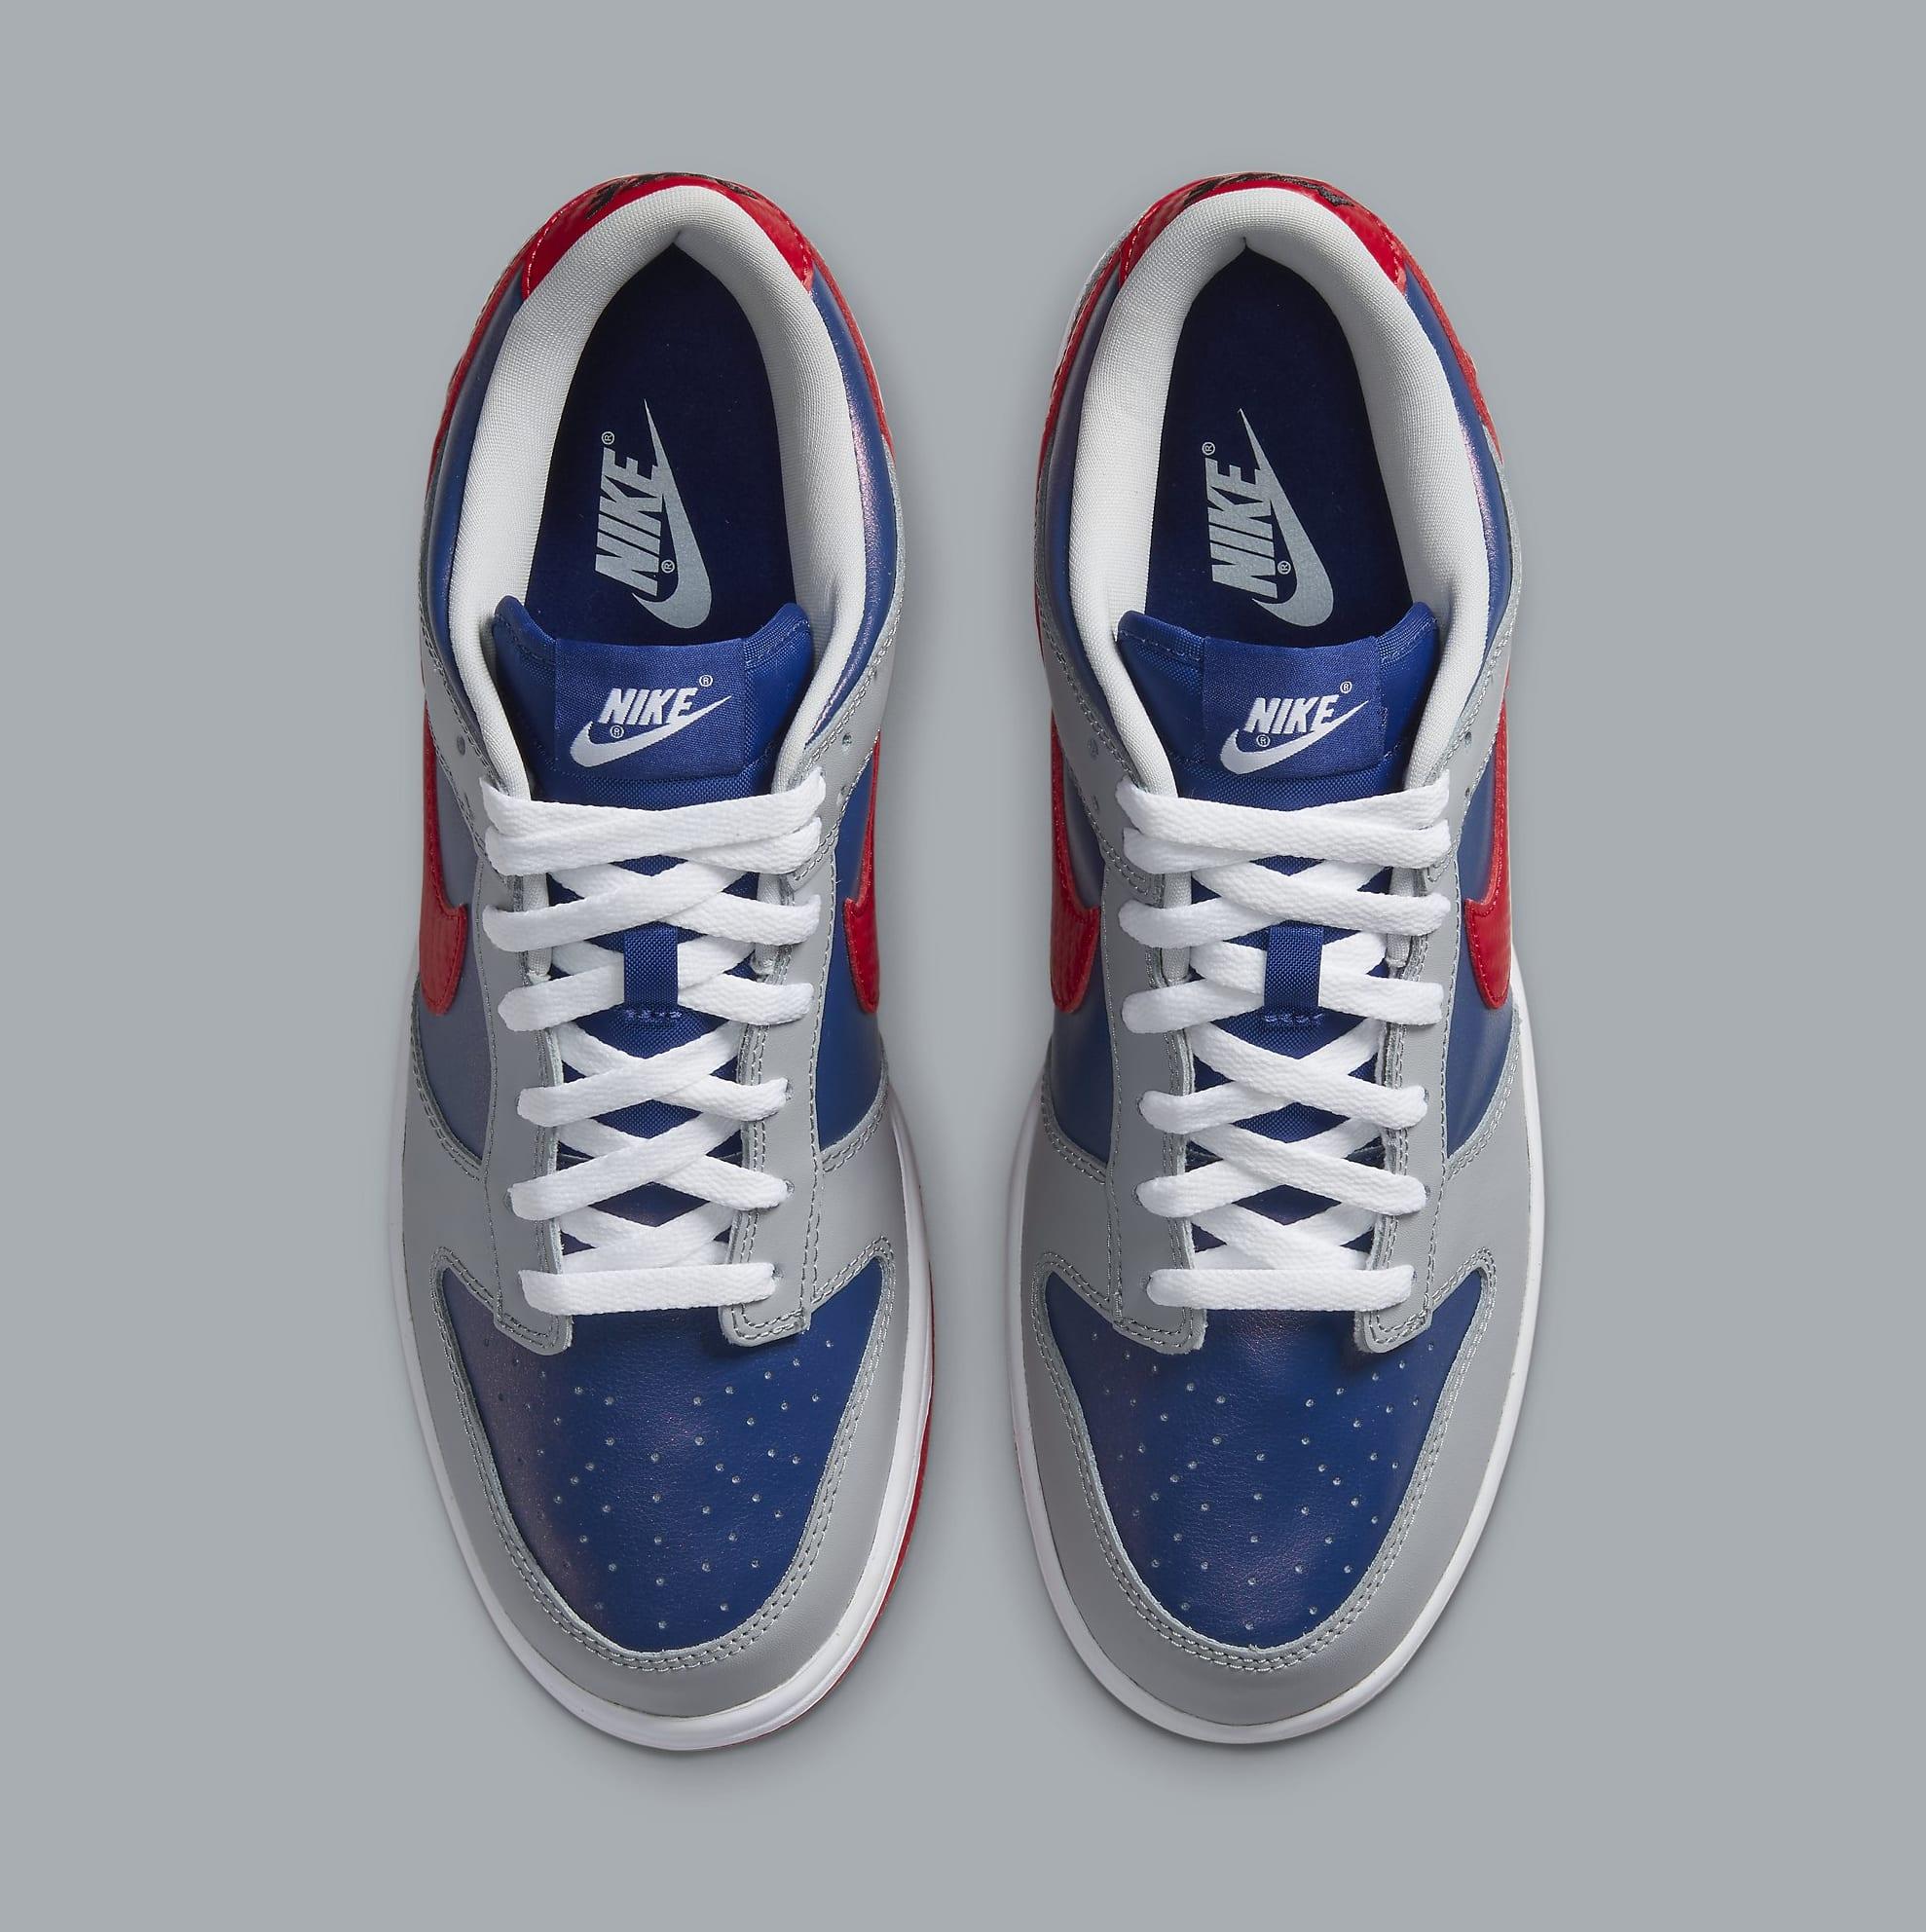 Nike Dunk Low Samba Release Date CZ2667-400 Top